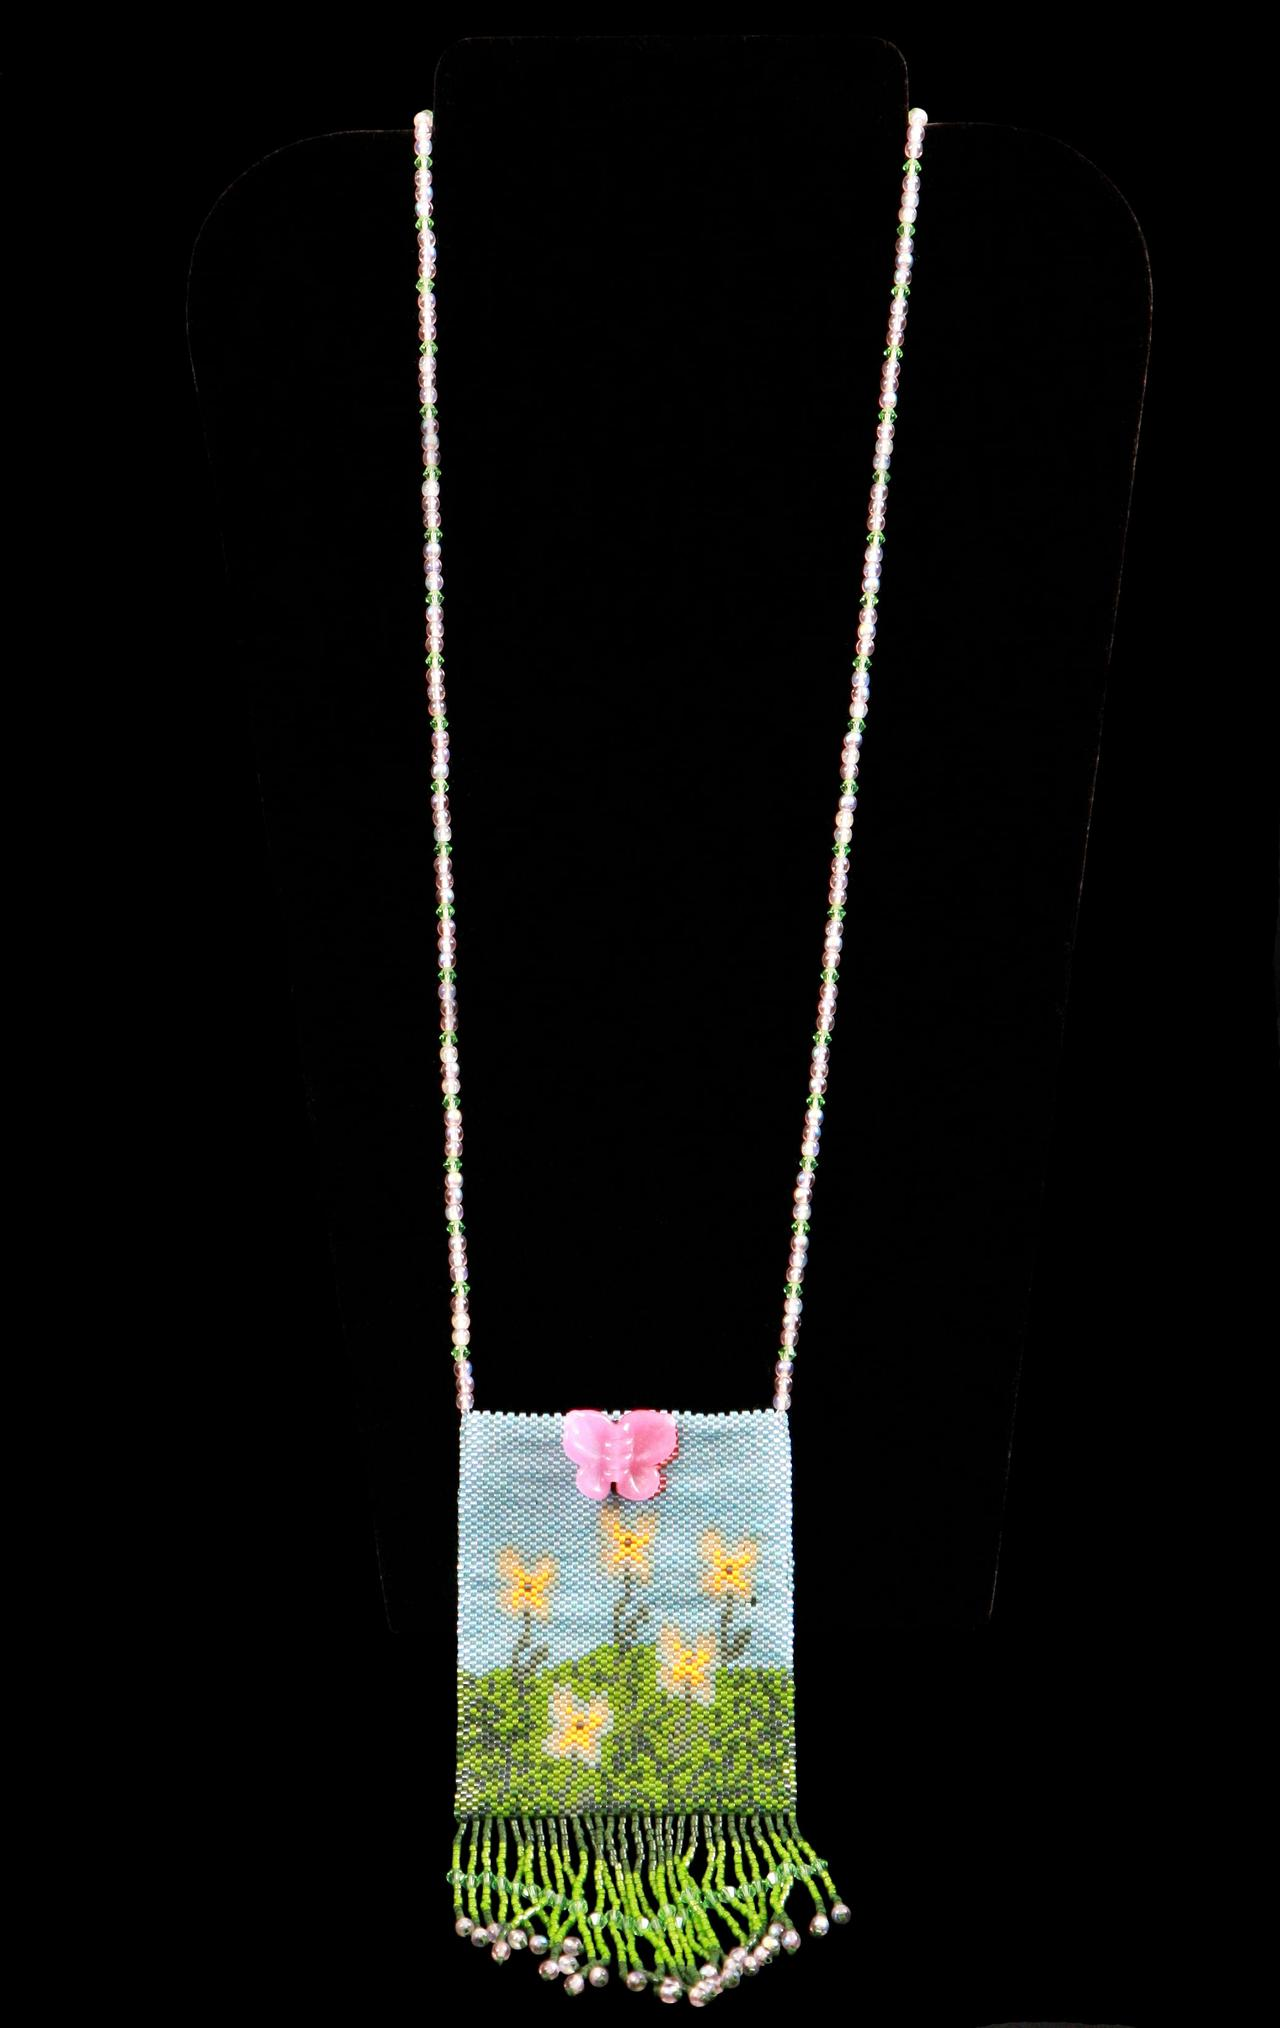 69d4aae8-0eb2-11e9-a325-0242ac110003-springtime_amulet_bag.jpg